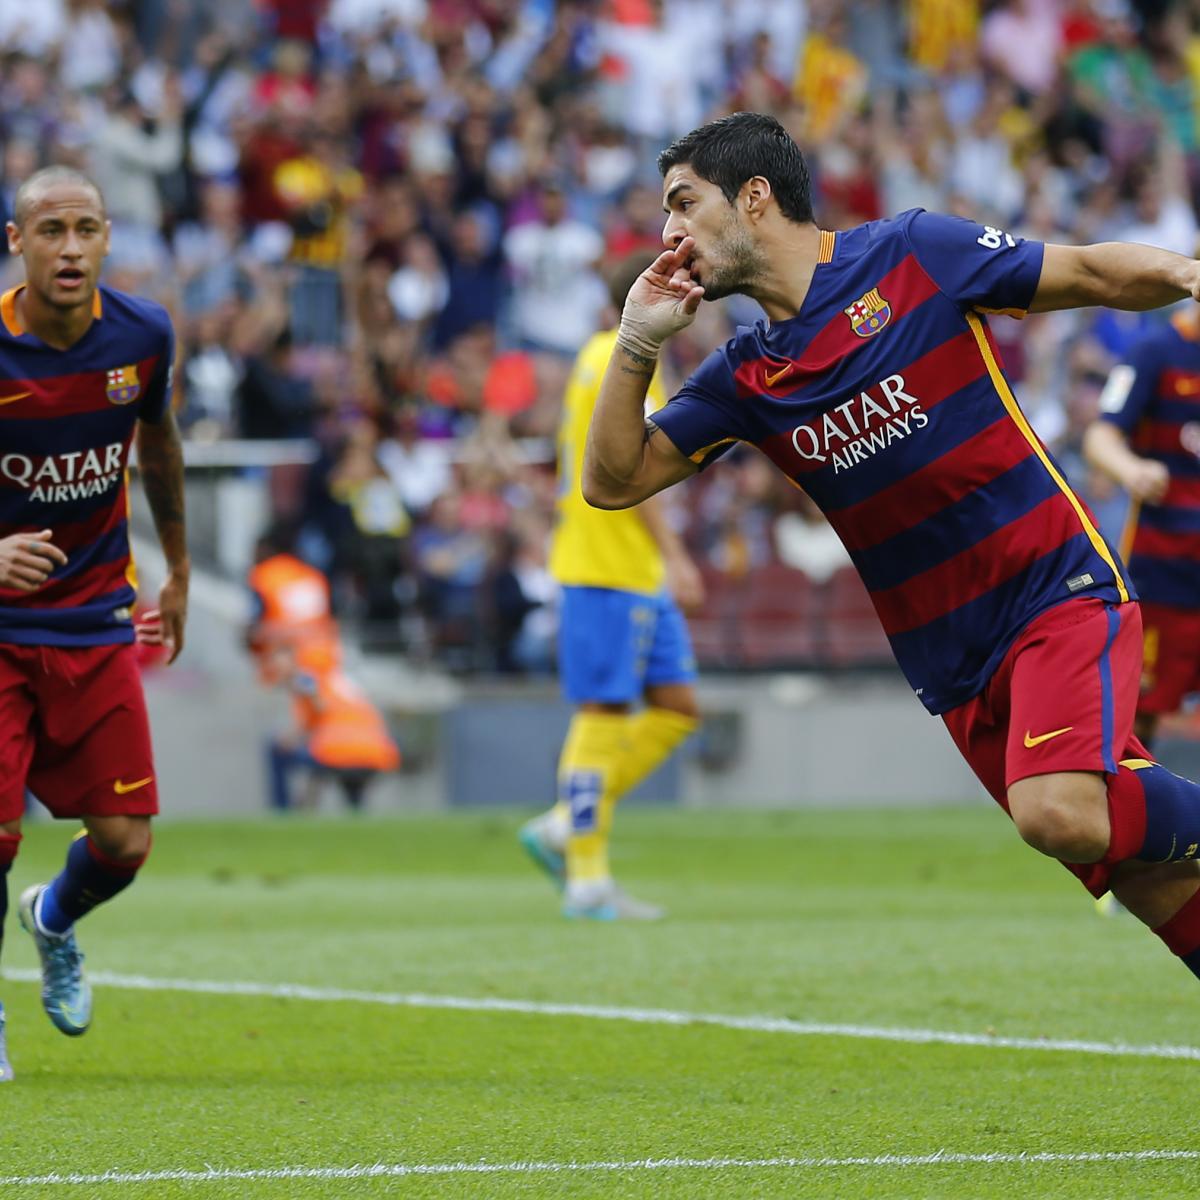 Barcelona Vs. Las Palmas: Score, Reaction From 2015 La